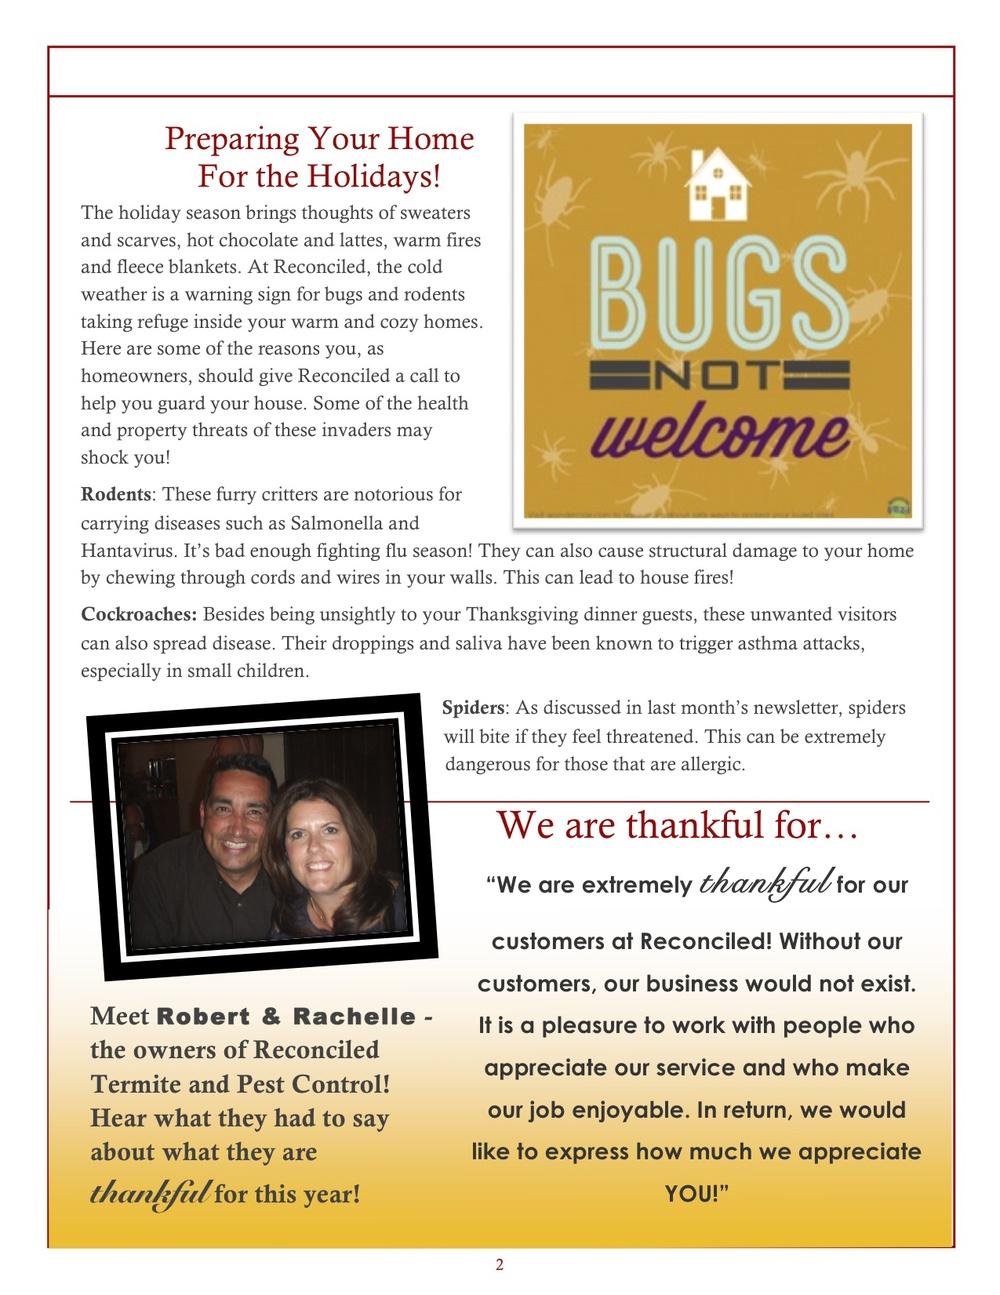 Novembert Reconciled Newsletter page 2.jpg